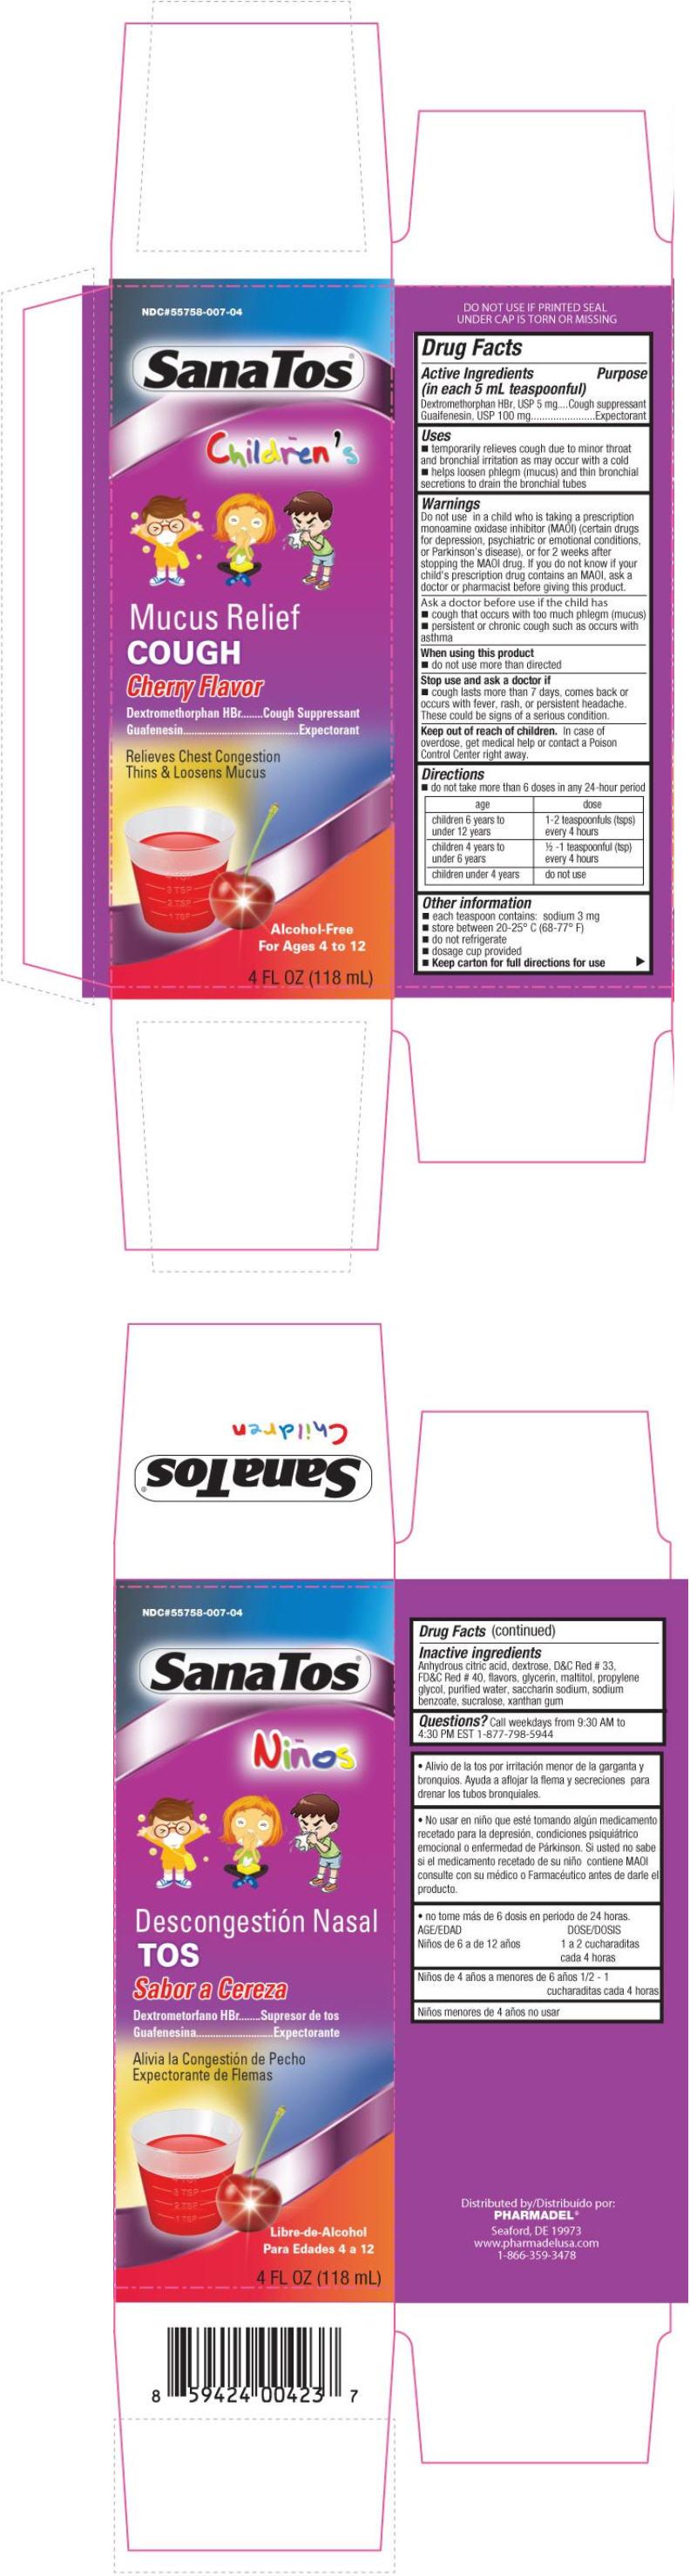 Sanatos Childrens Mucus Relief Cough (Dextromethorphan Hydrobromide And Guaifenesin) Liquid [Pharmadel Llc]